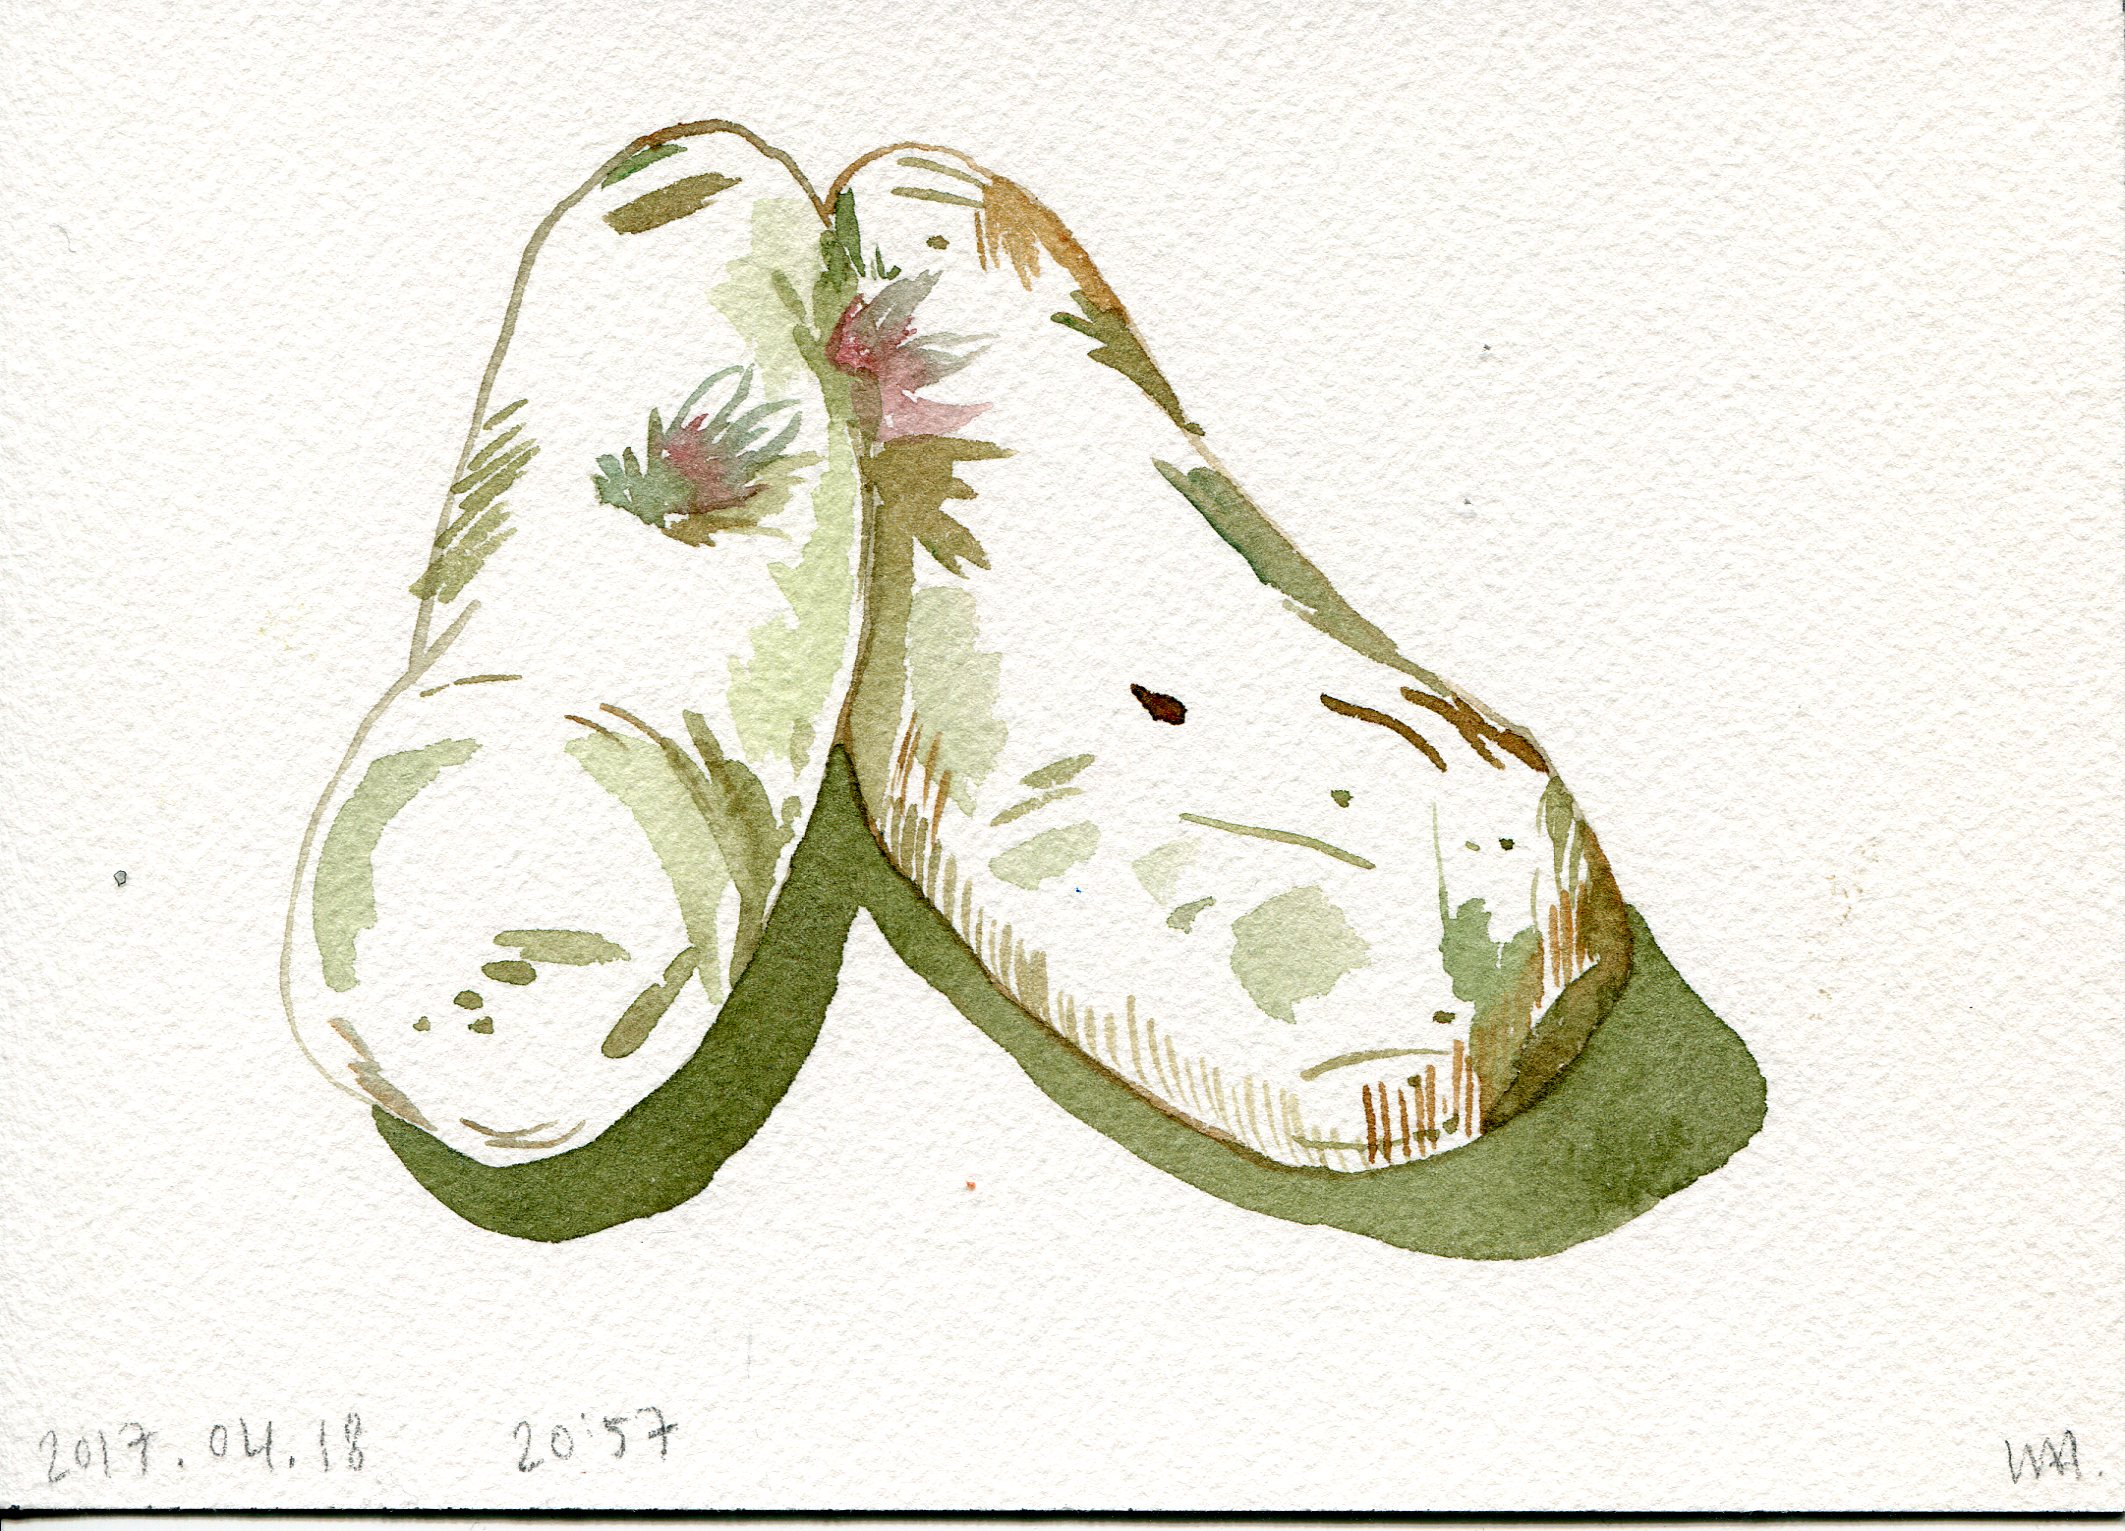 2017-04-23 drawing002.jpg